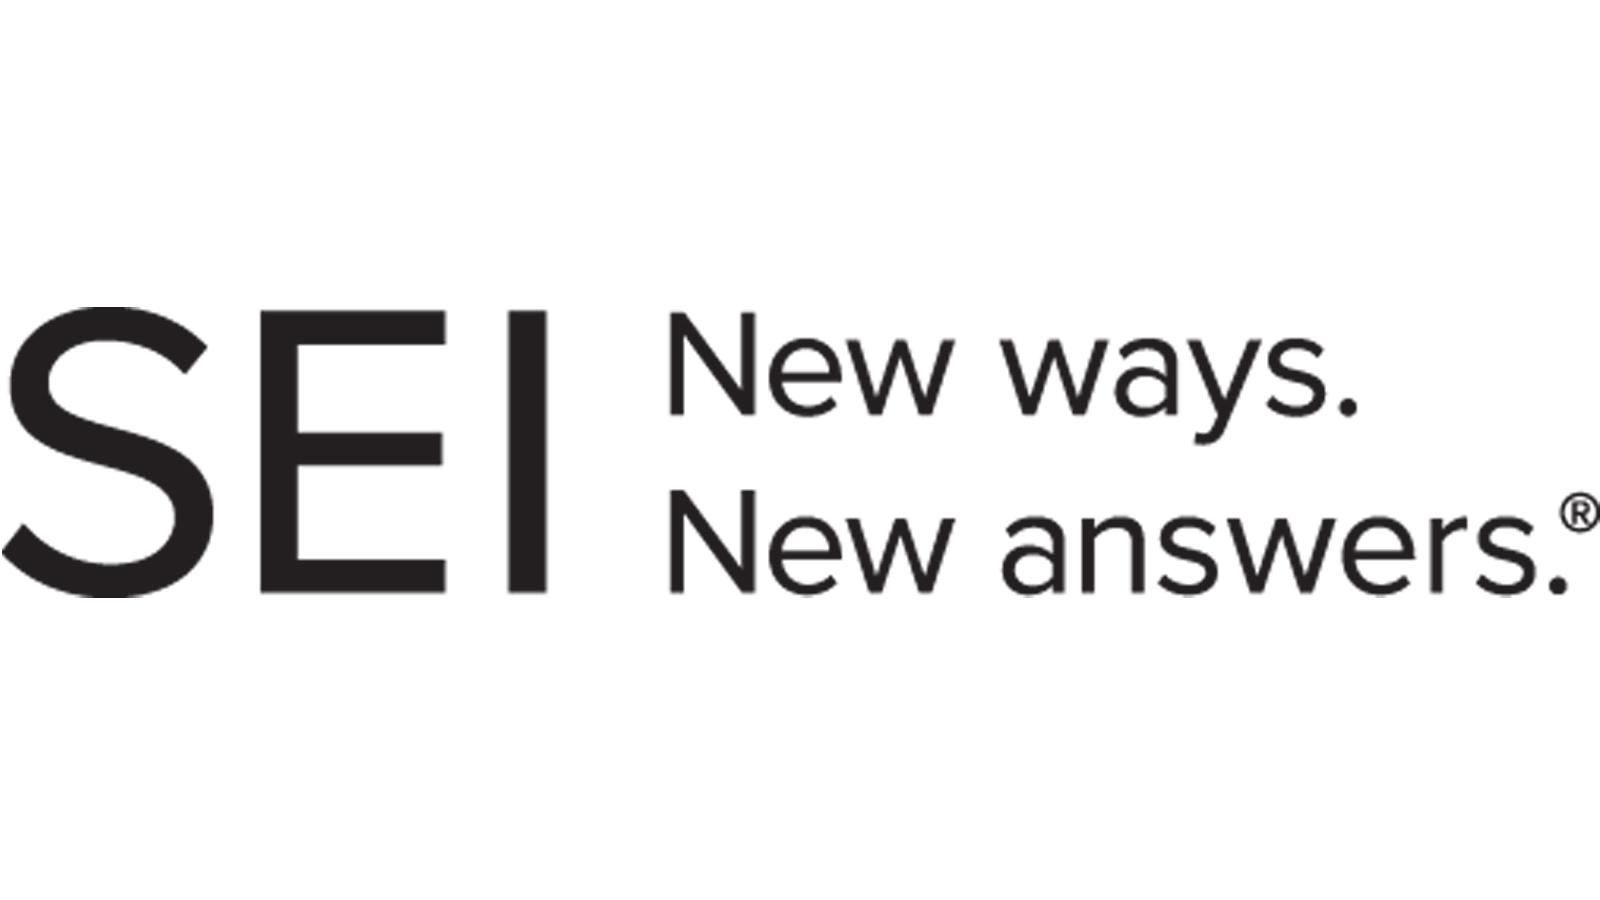 SEI Investments